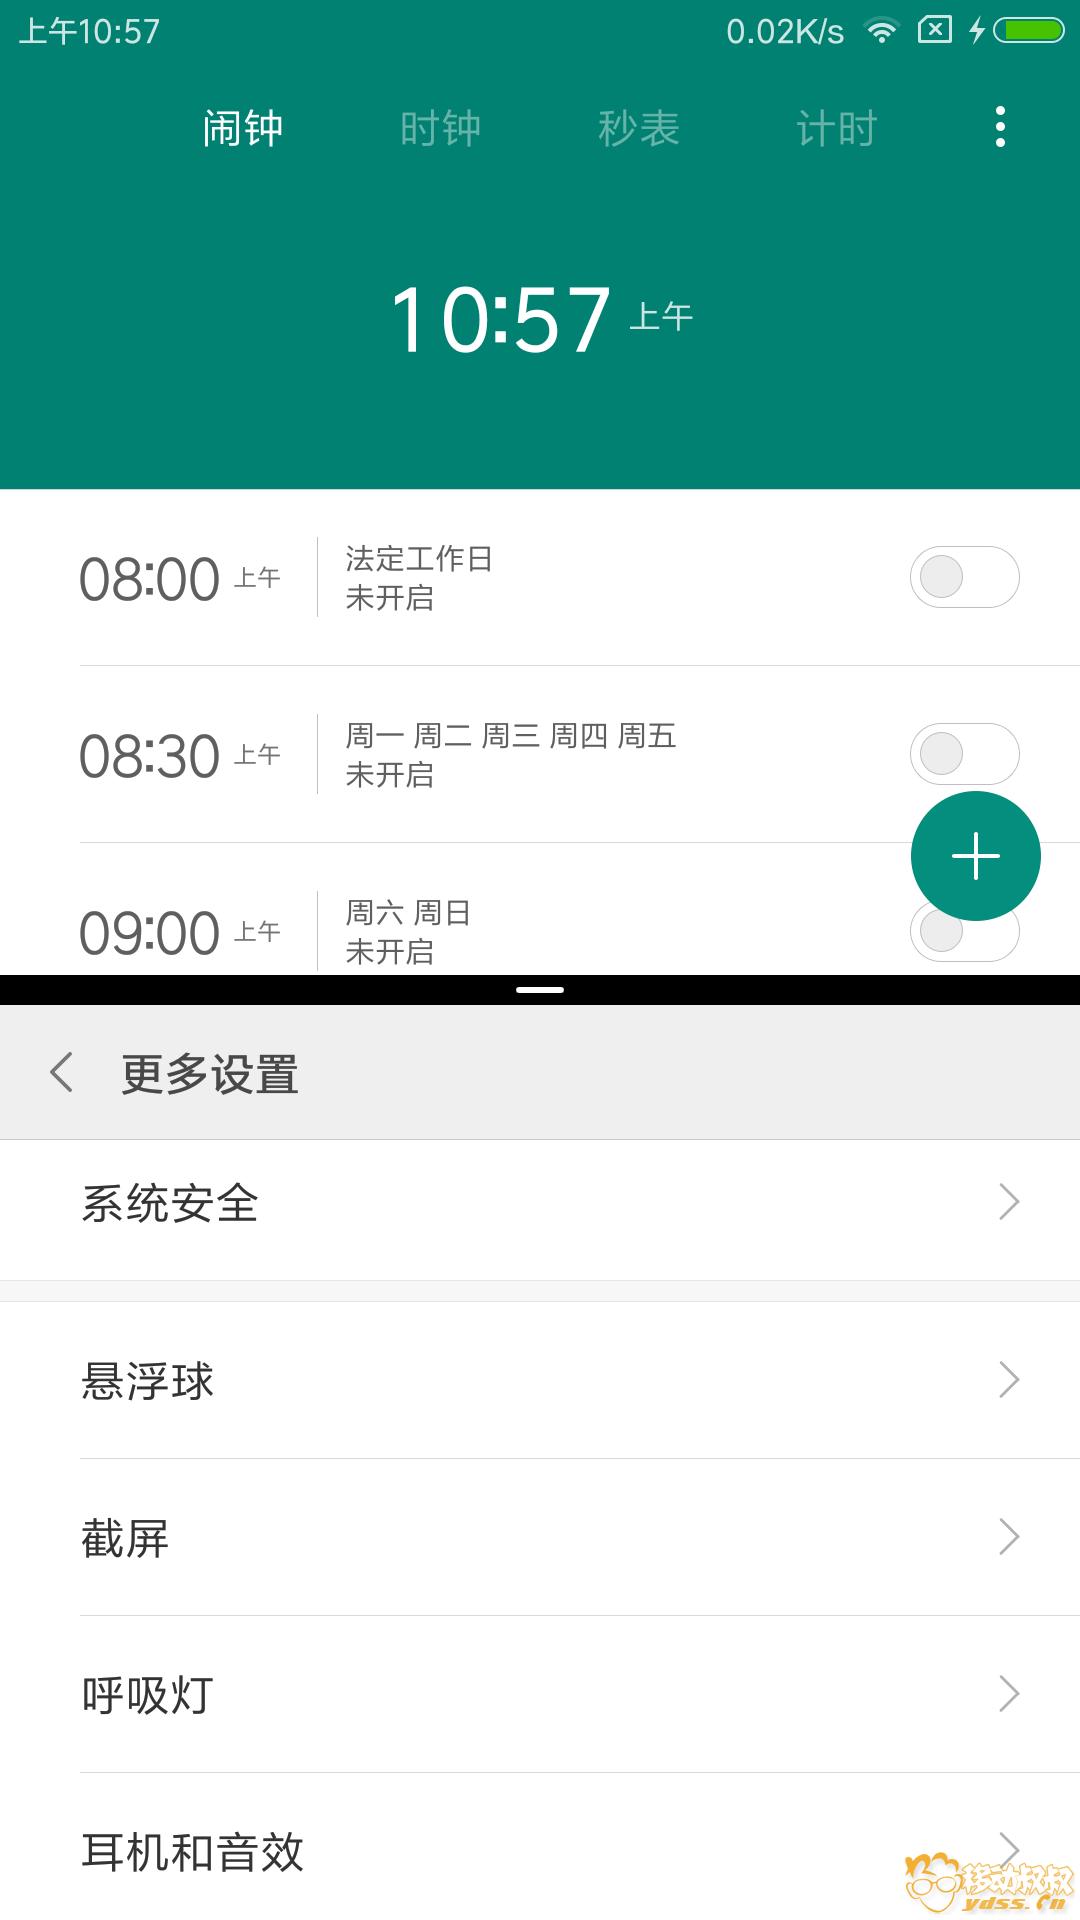 Screenshot_2017-07-22-10-57-12-653_com.android.settings.png